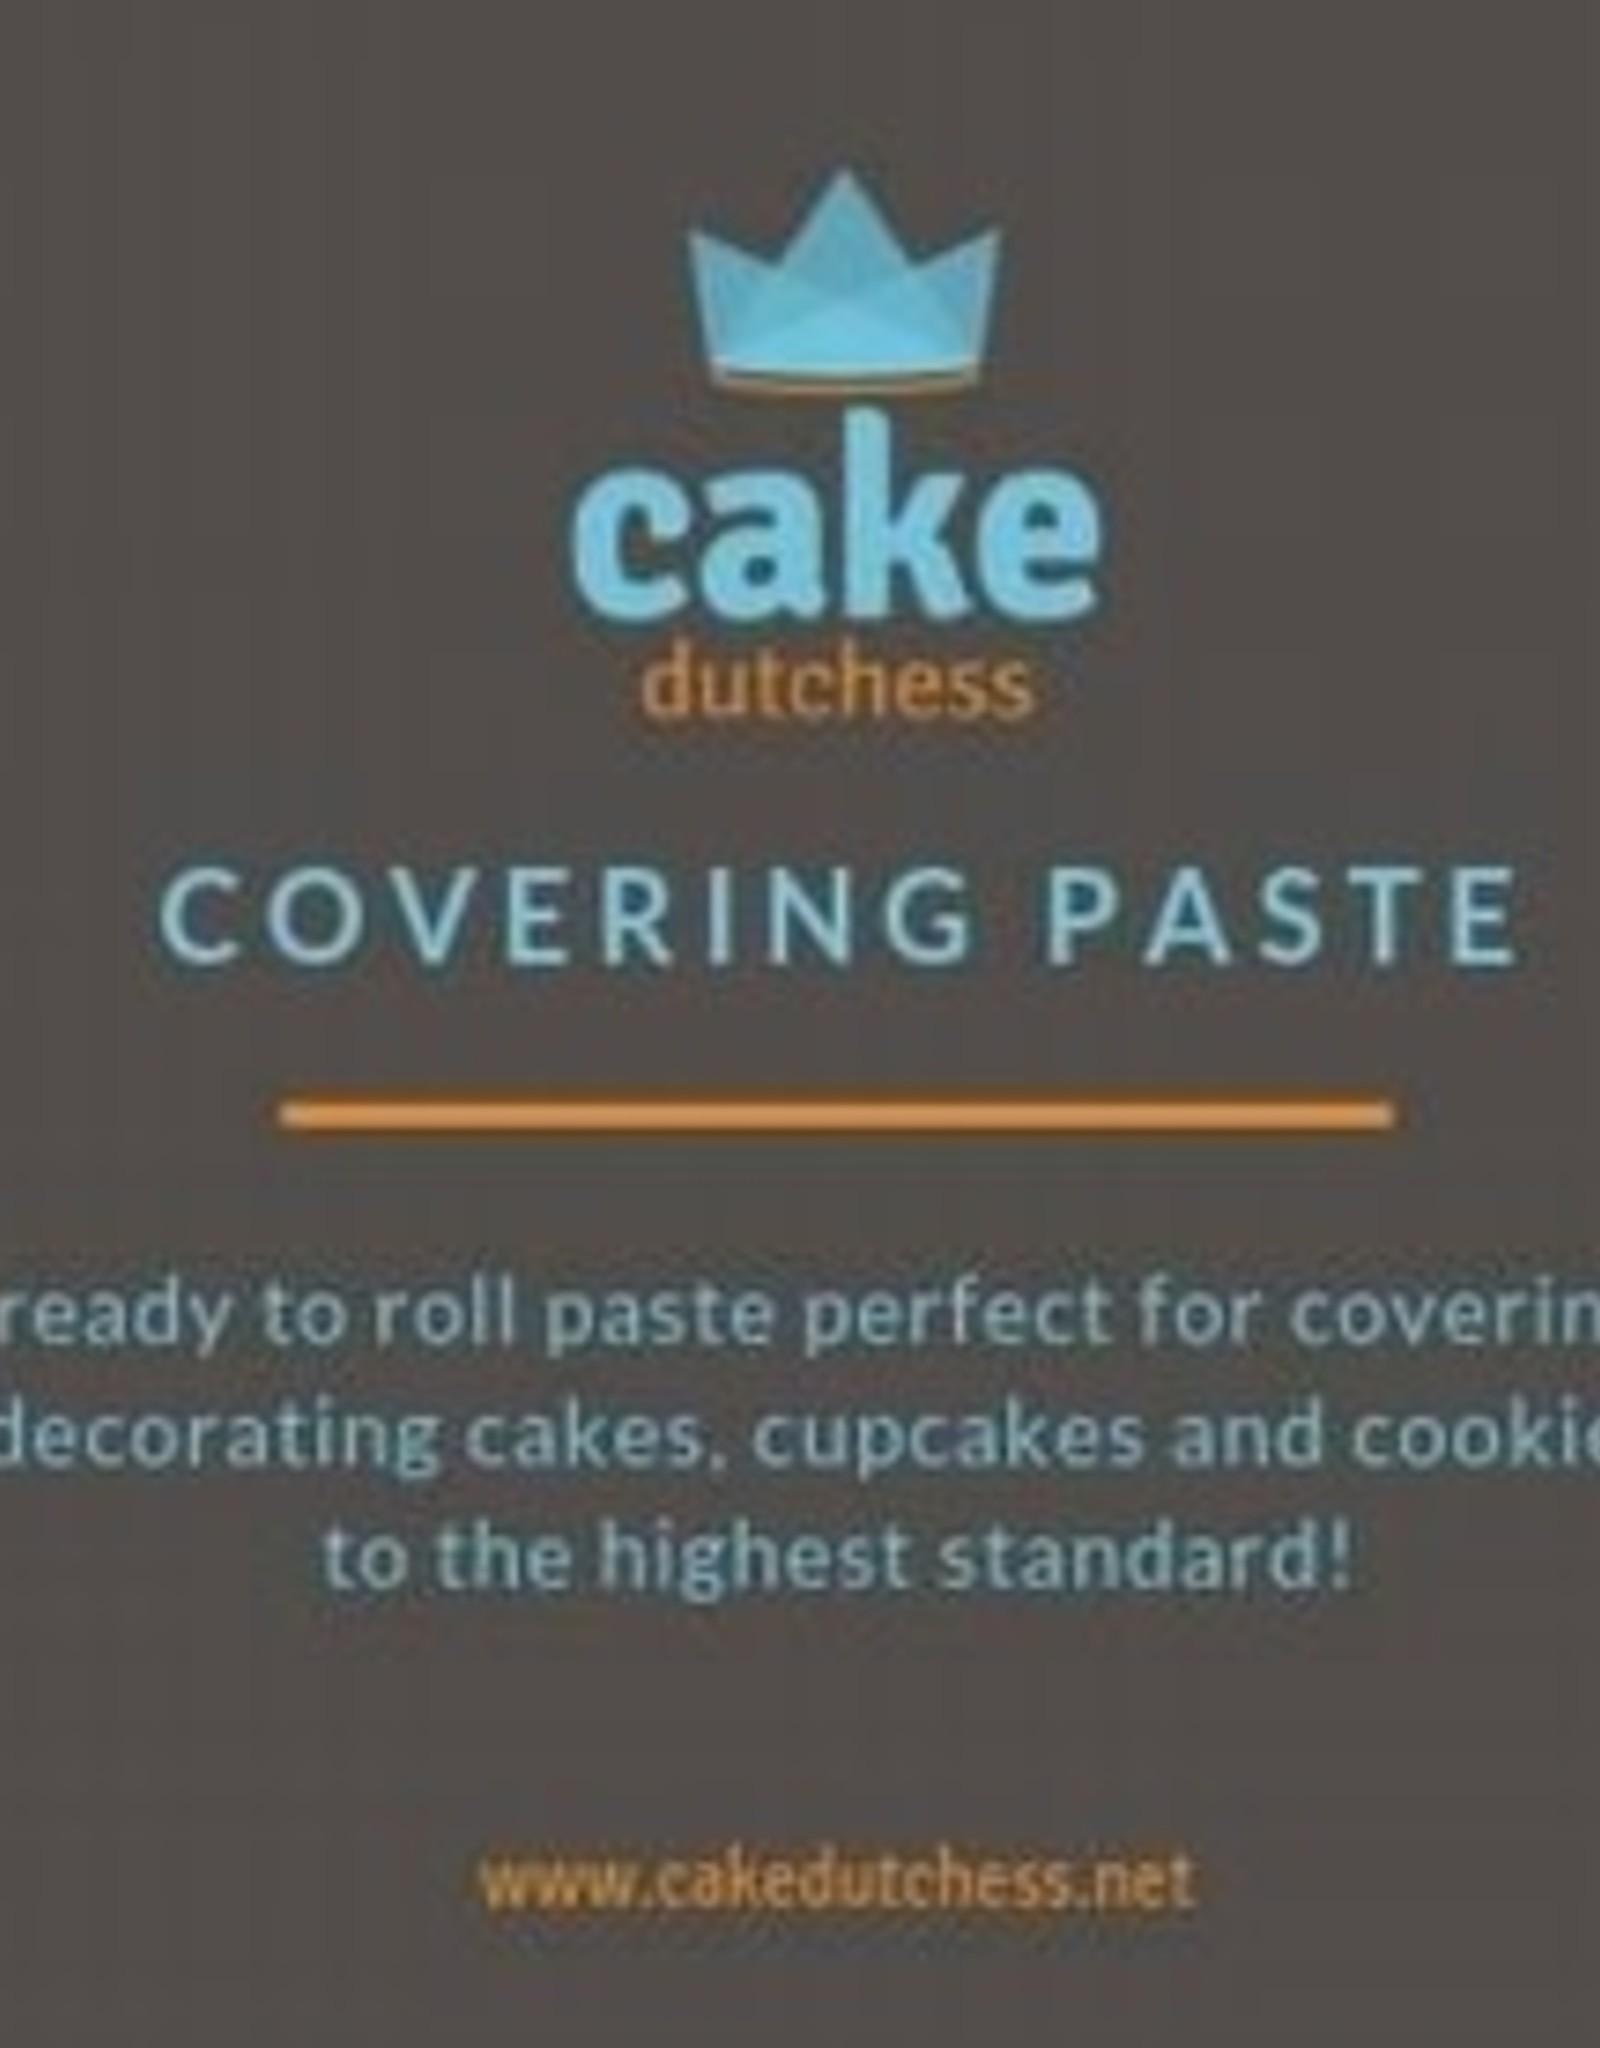 Cake Dutchess Cake Dutchess Covering Paste 1kg